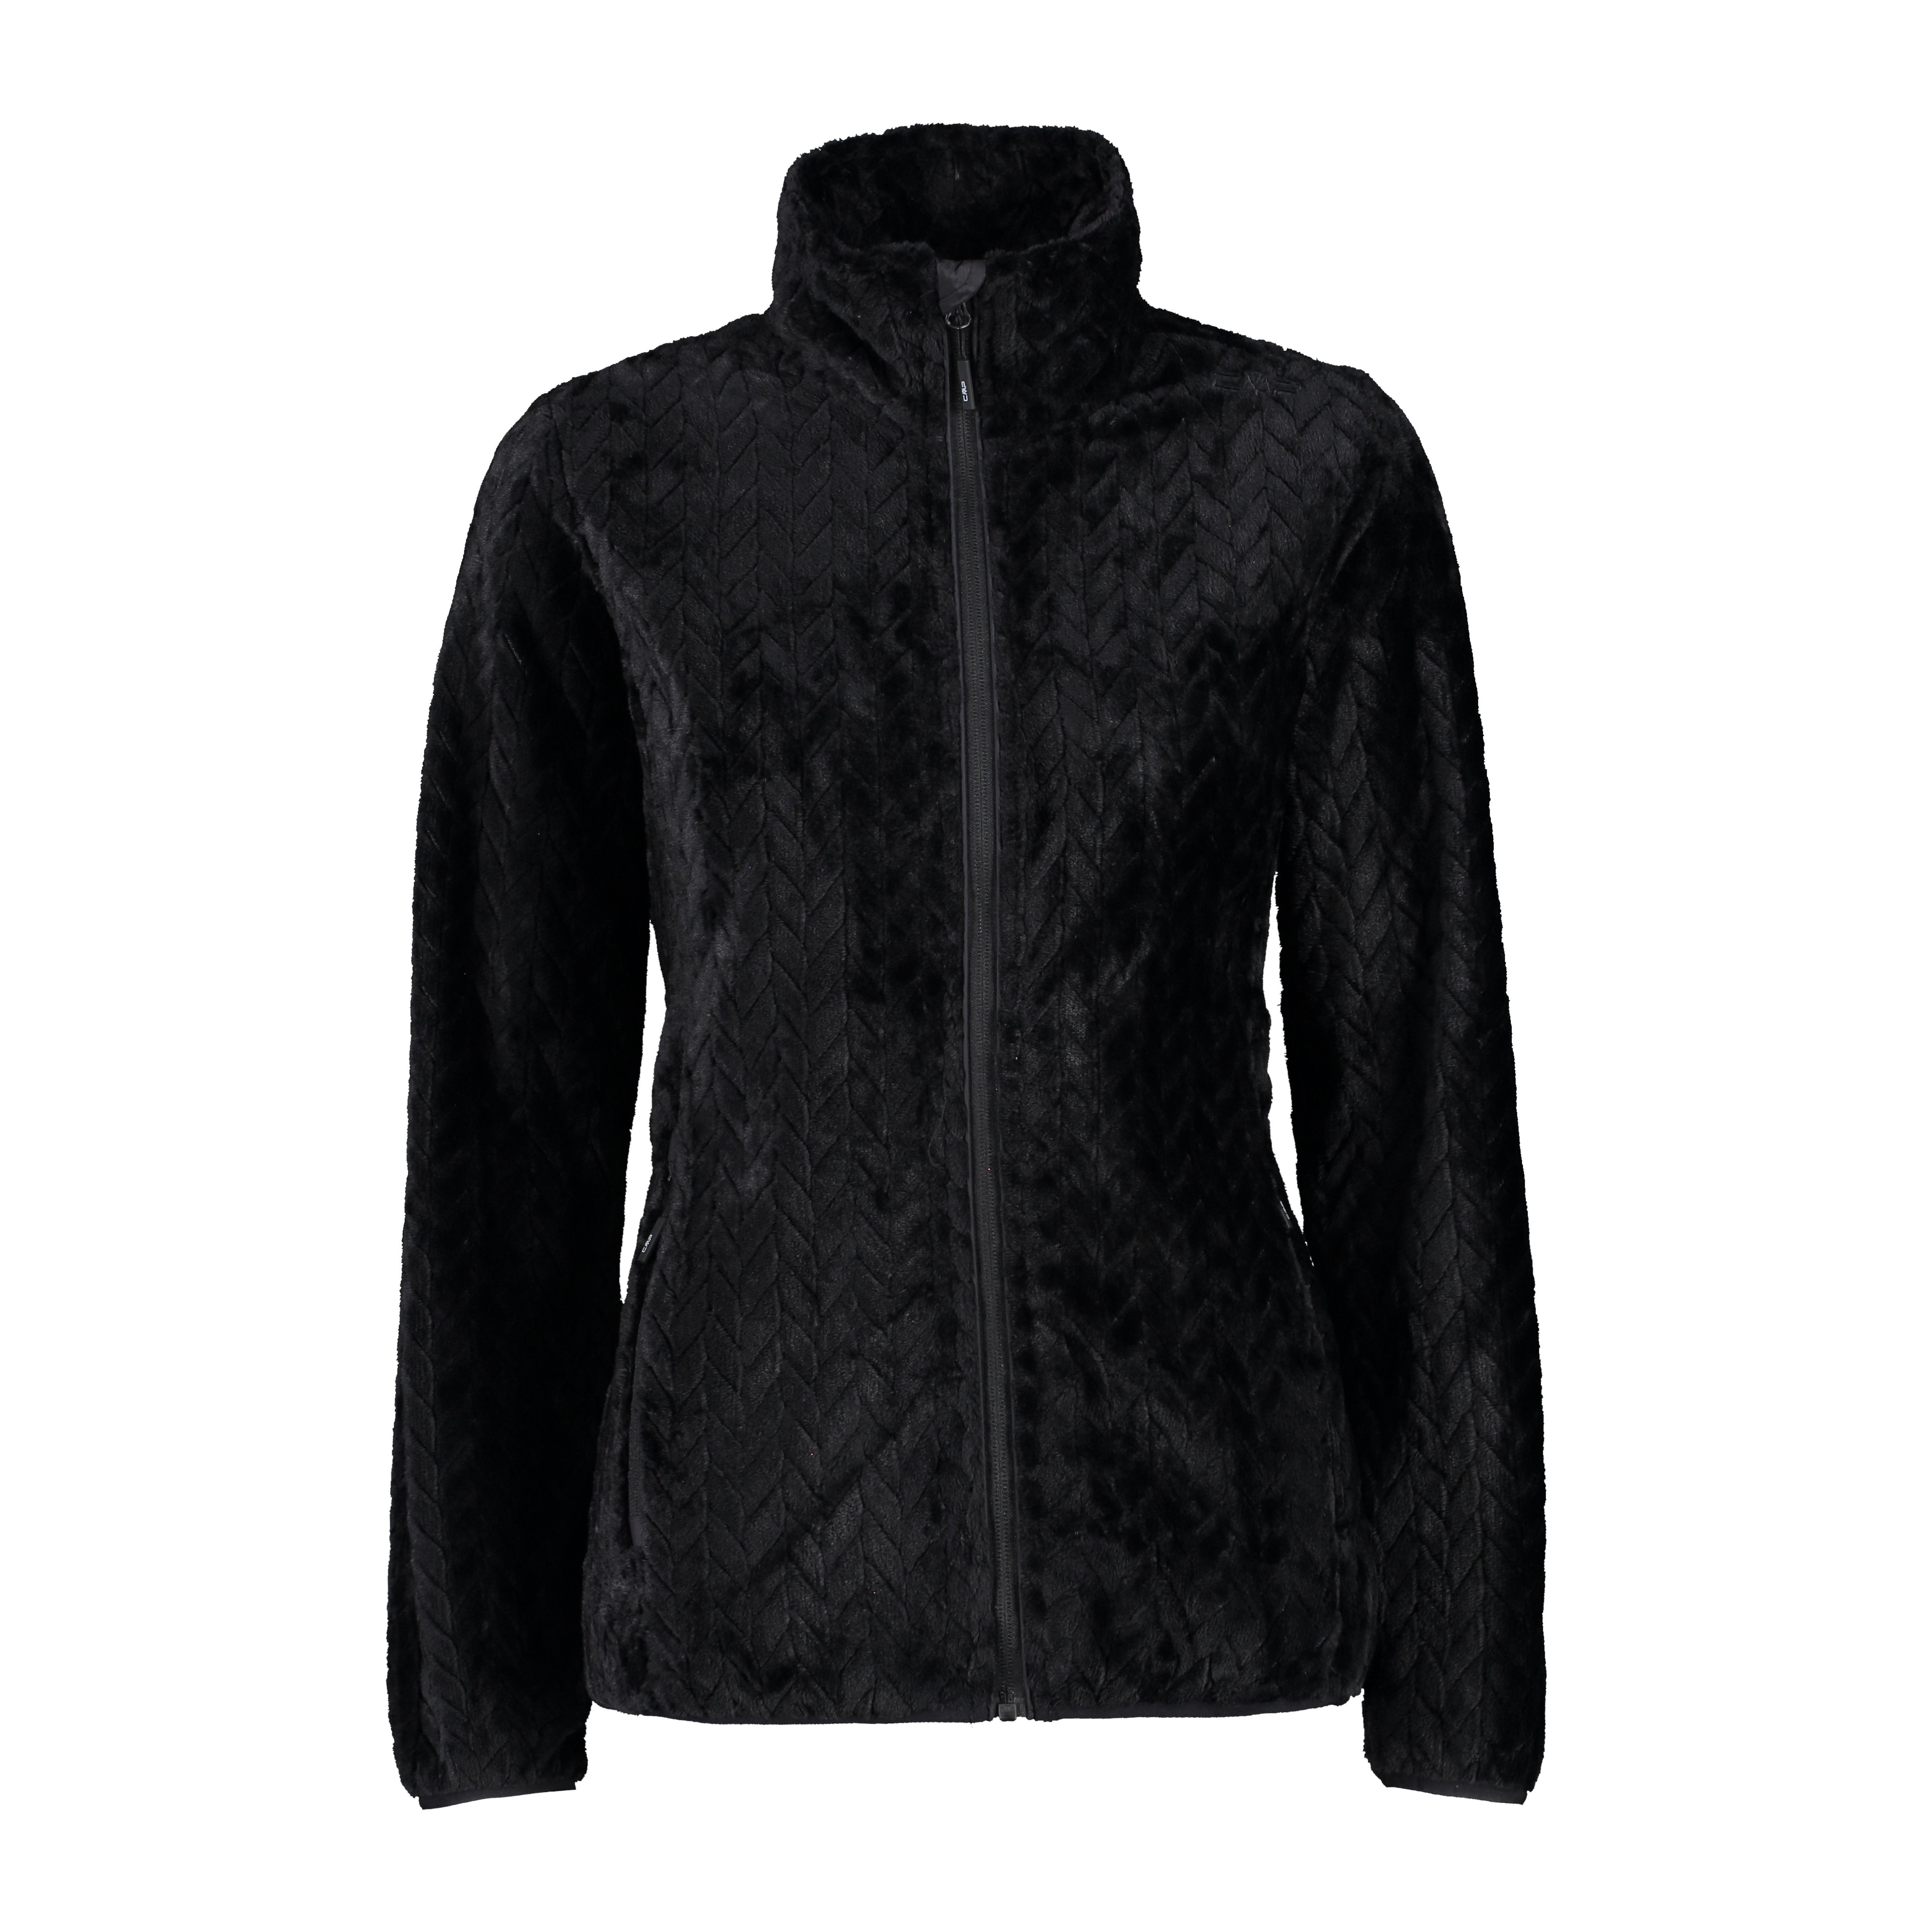 Woman Jacket W